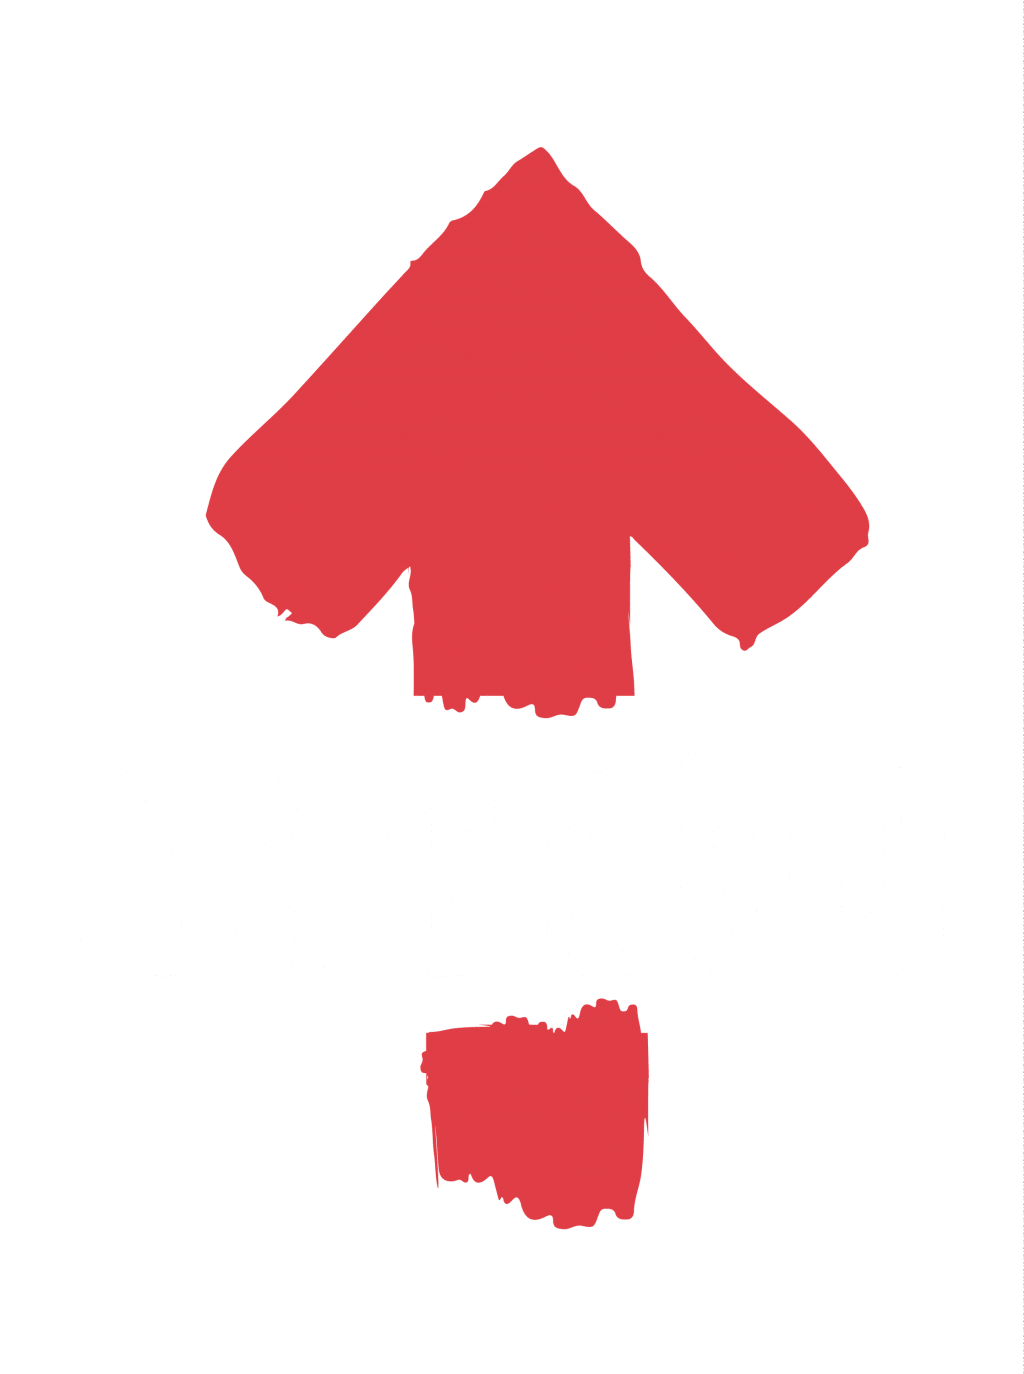 ascend_red_wht